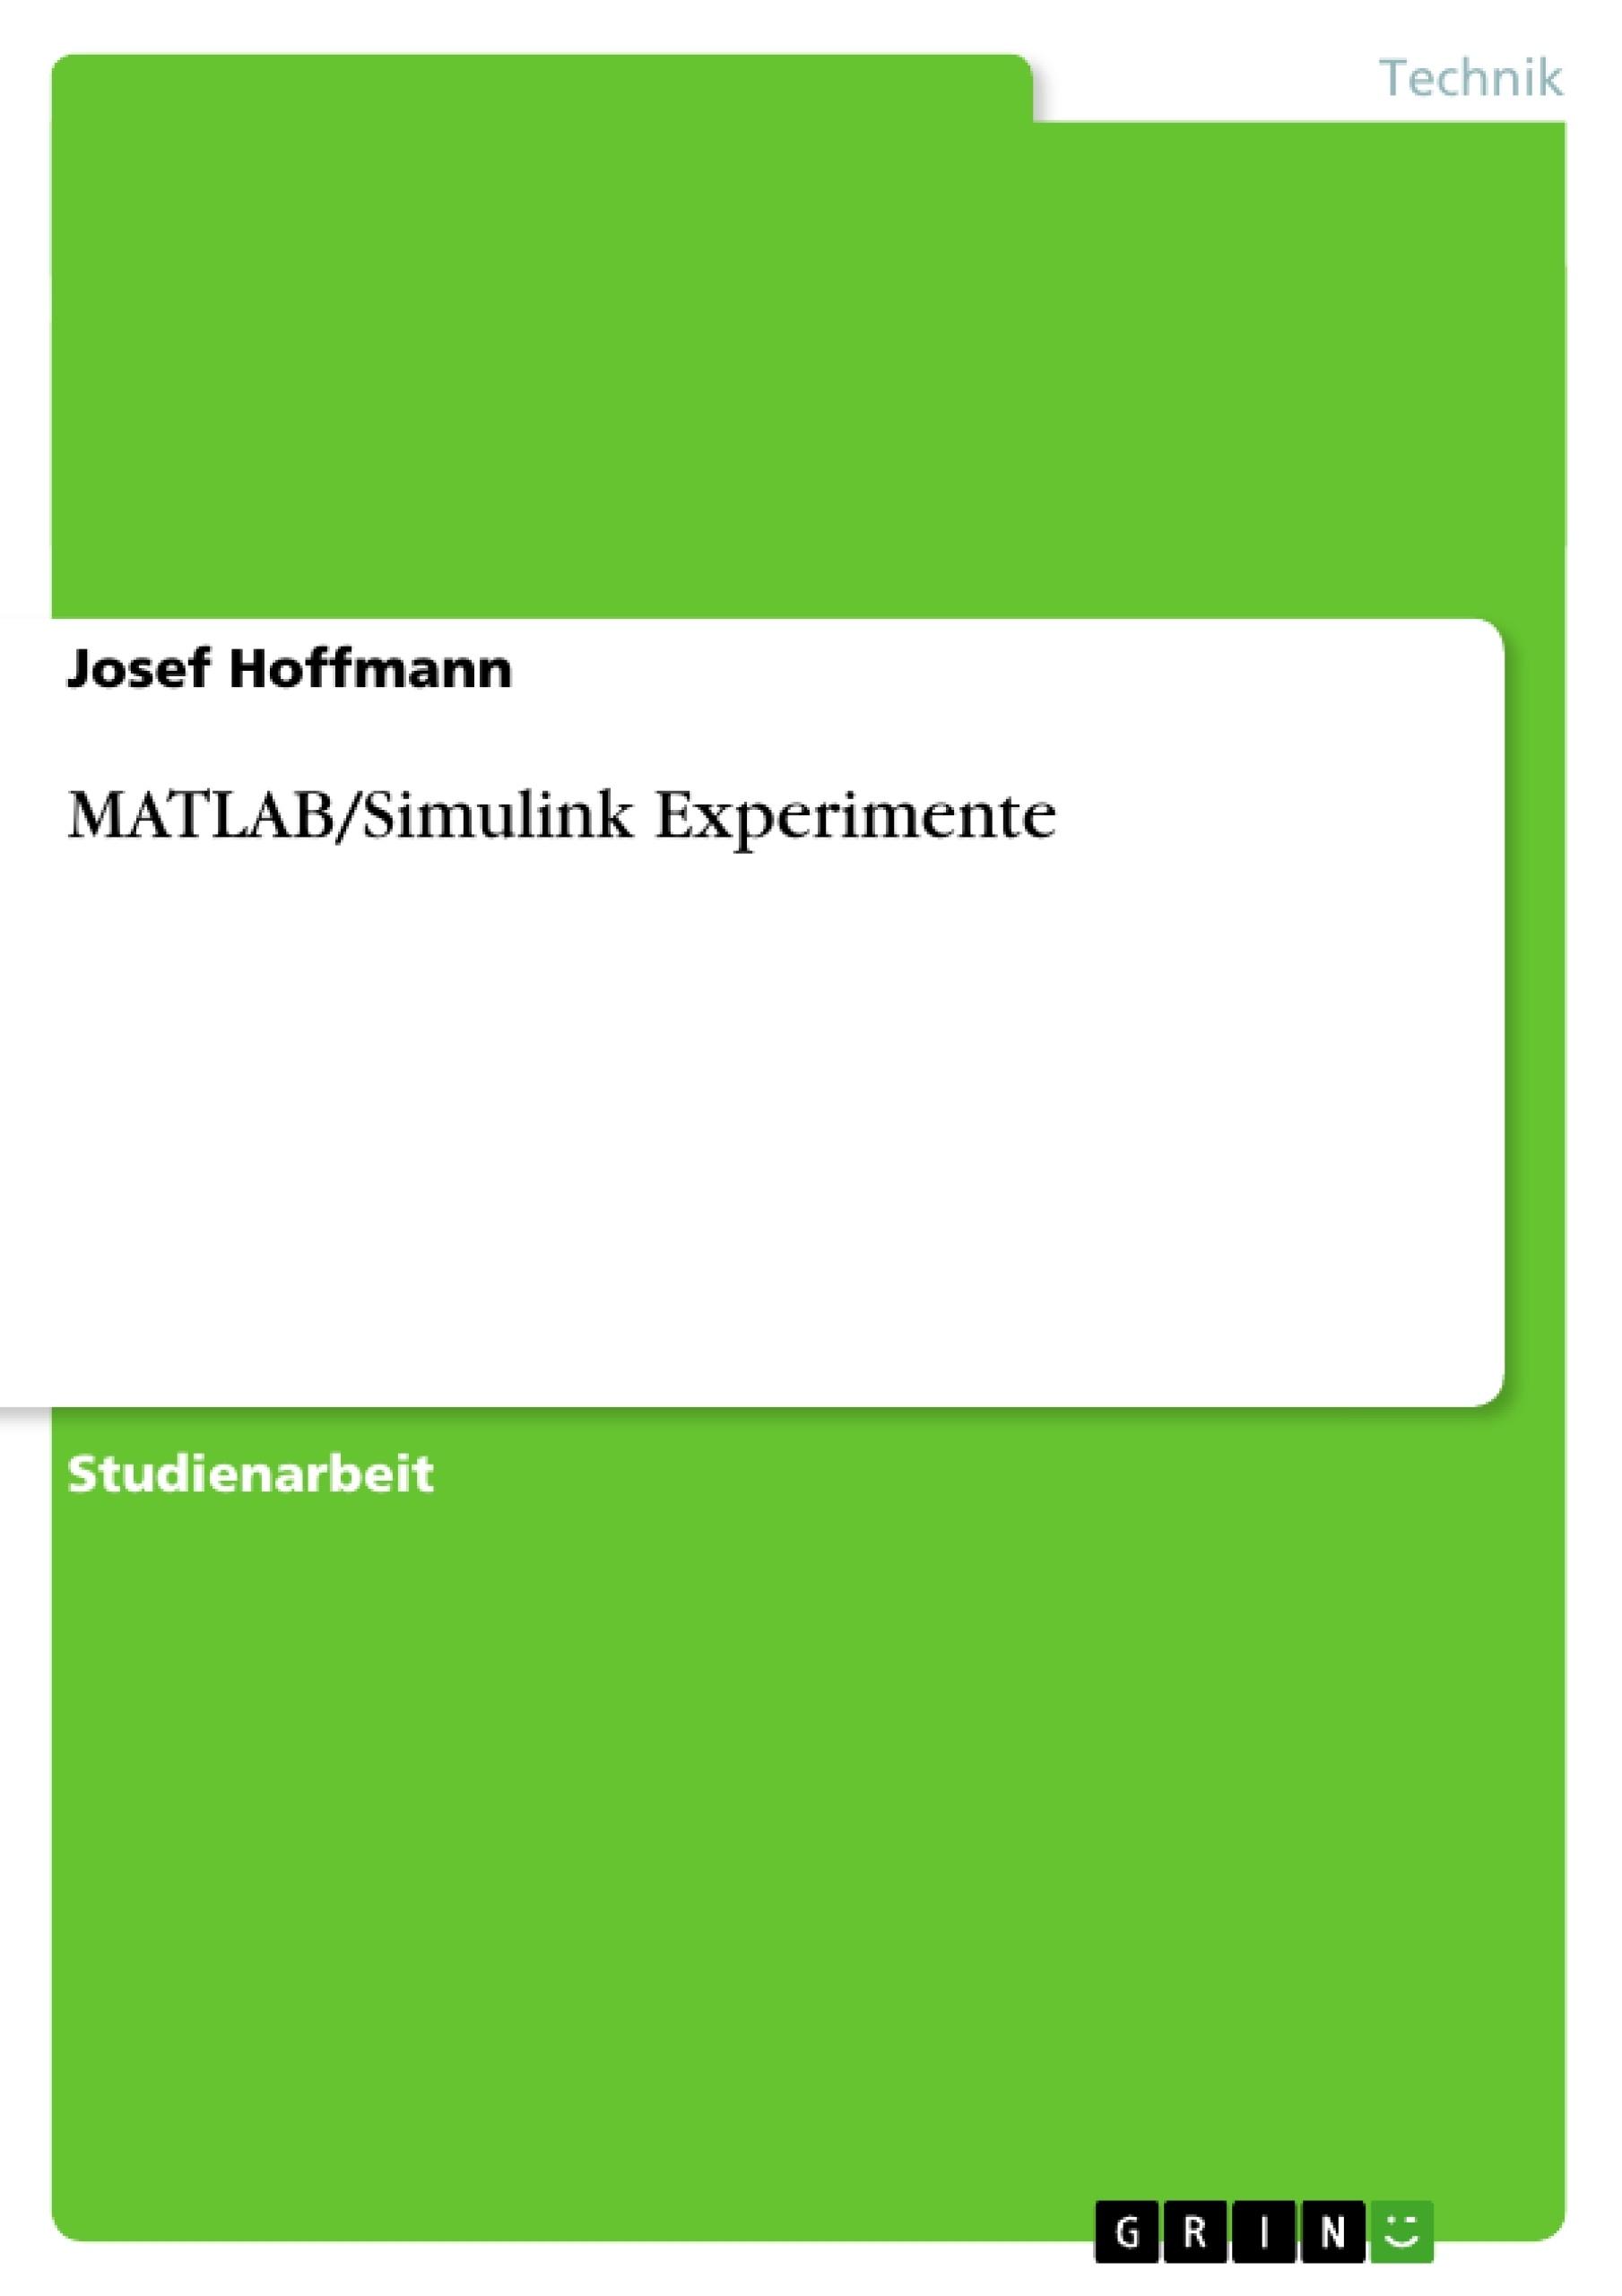 Titel: MATLAB/Simulink Experimente